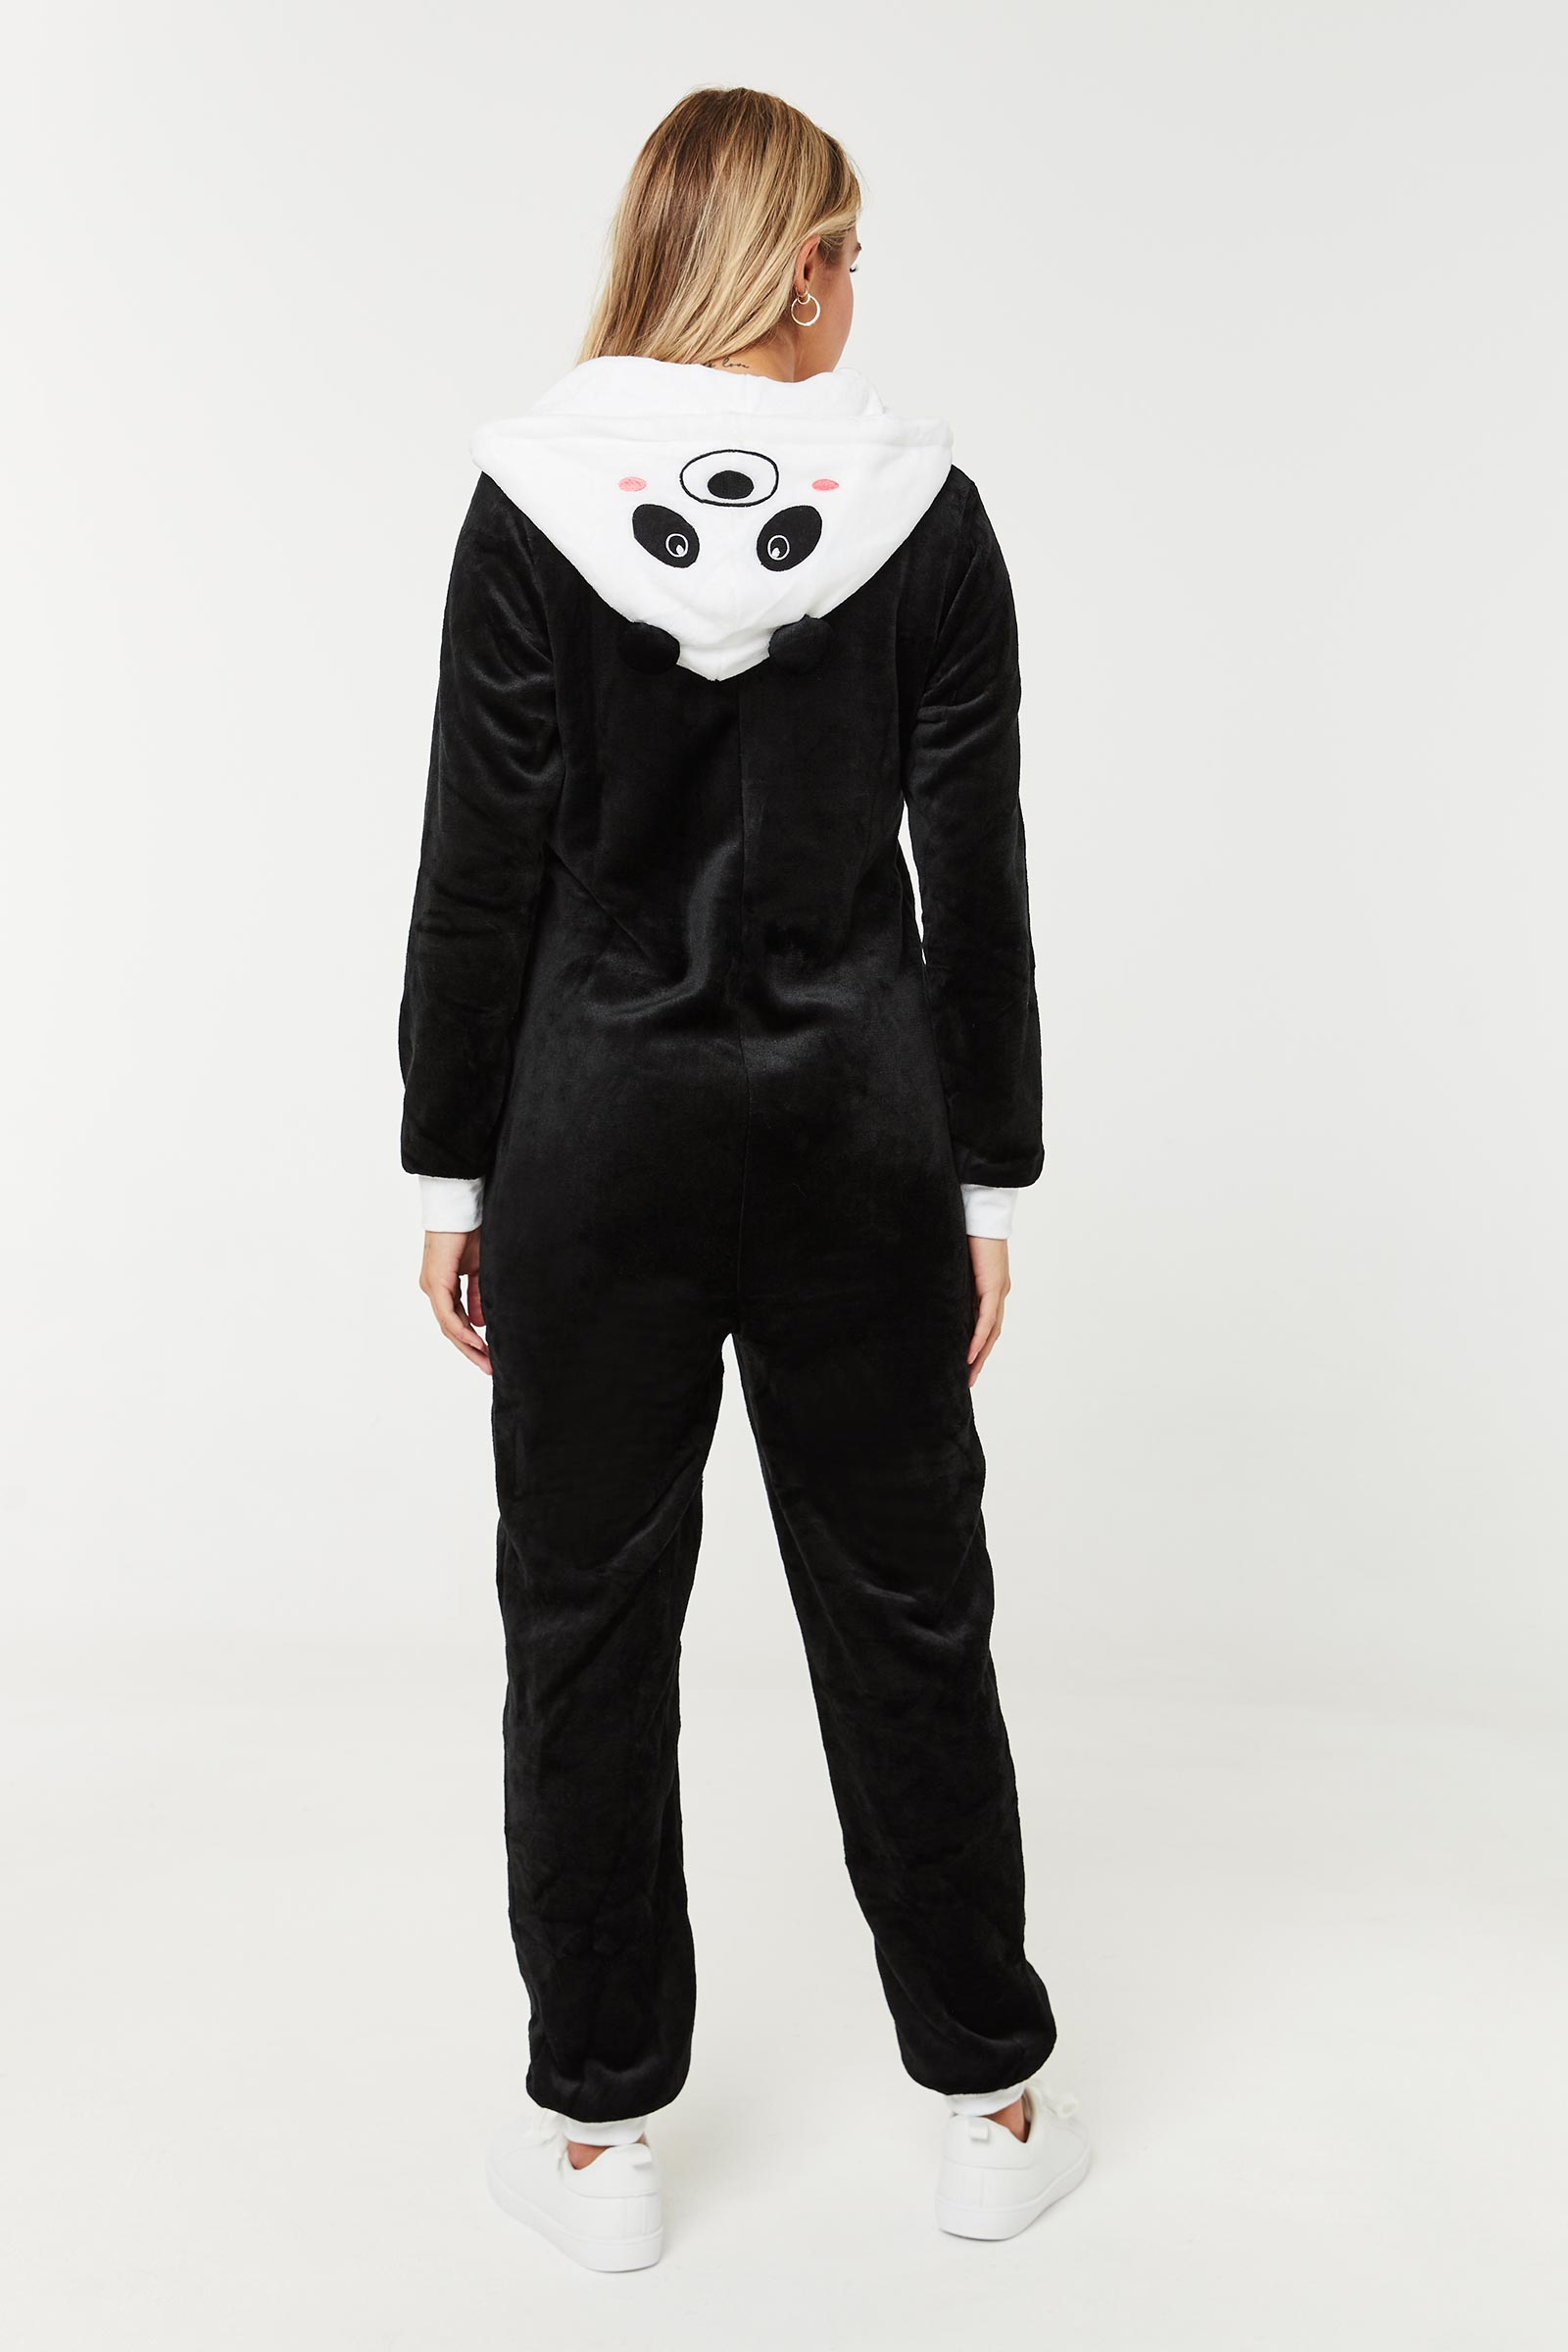 Panda Onesie Costume